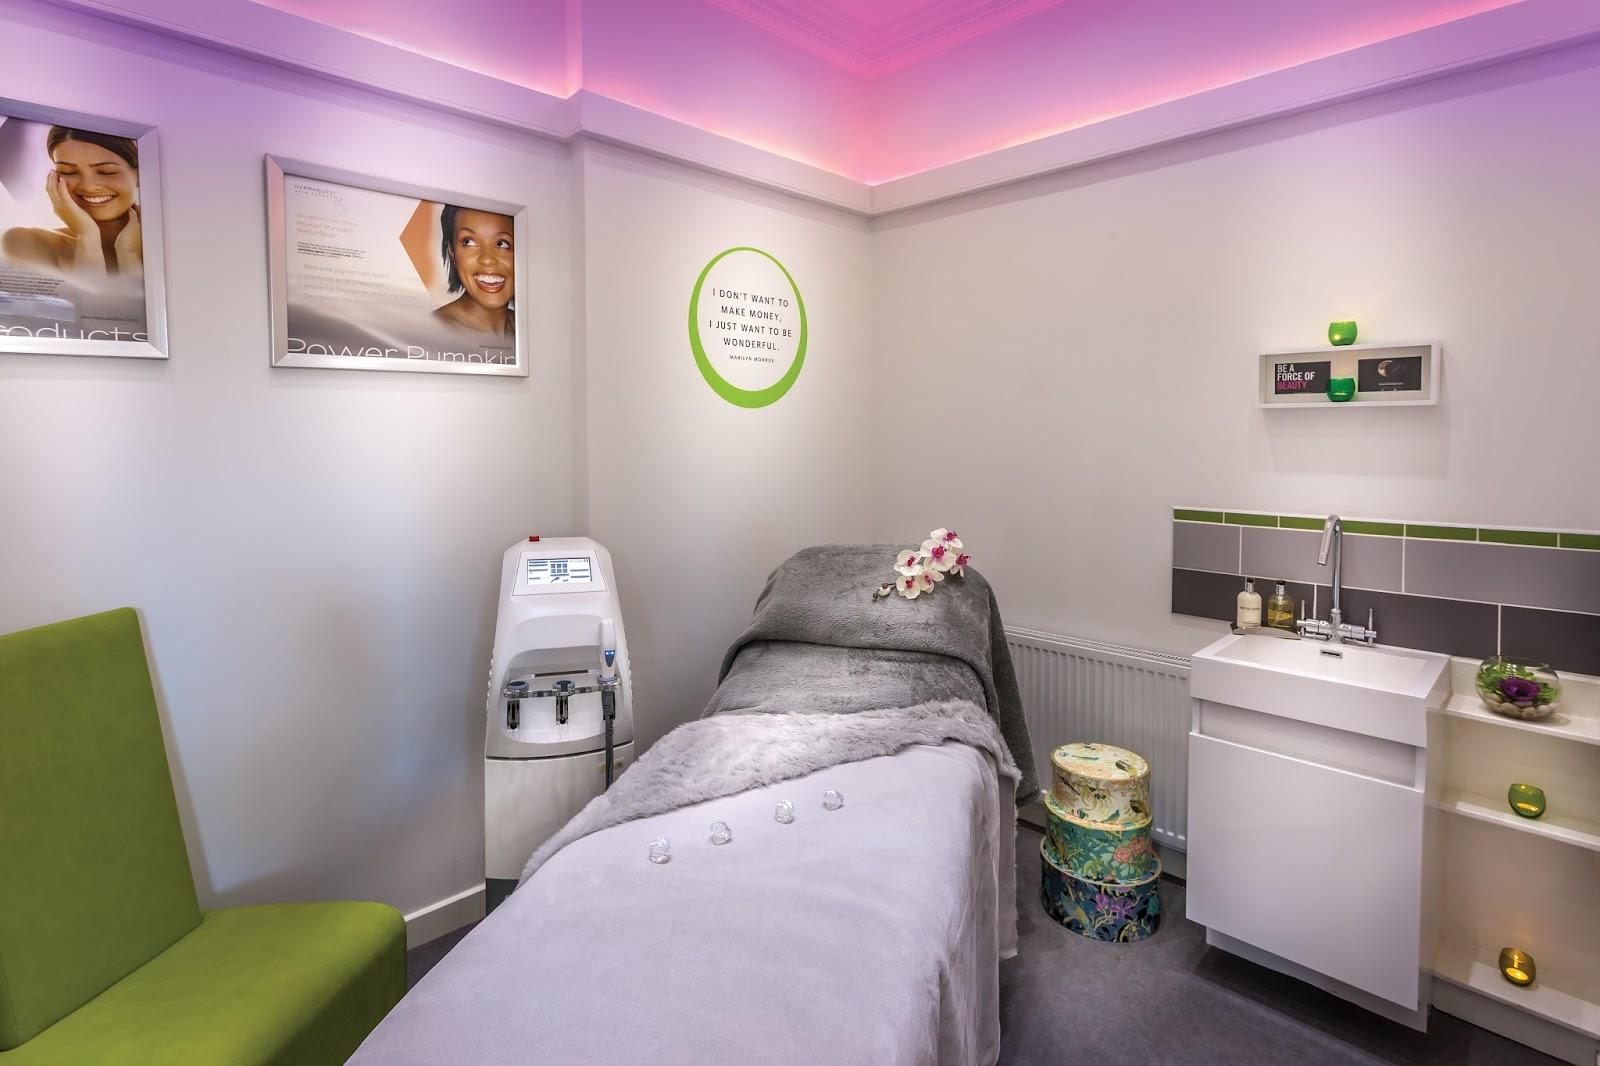 Yuu beauty little blog of horrors for Beauty treatment room decor ideas